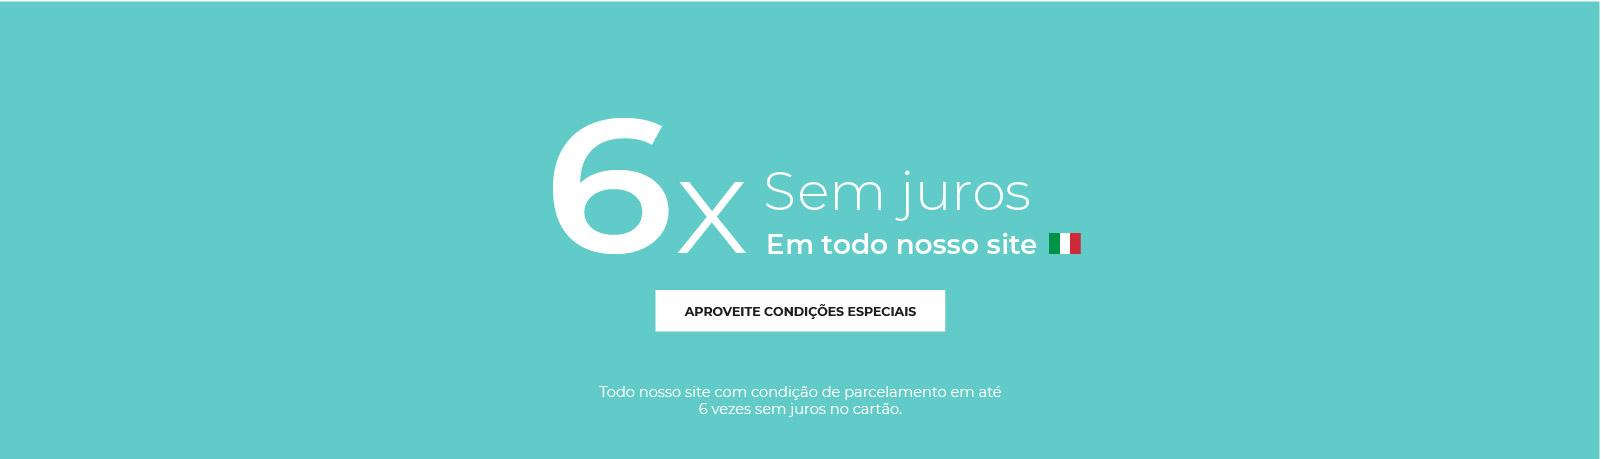 6X SEM JUROS MOBILE